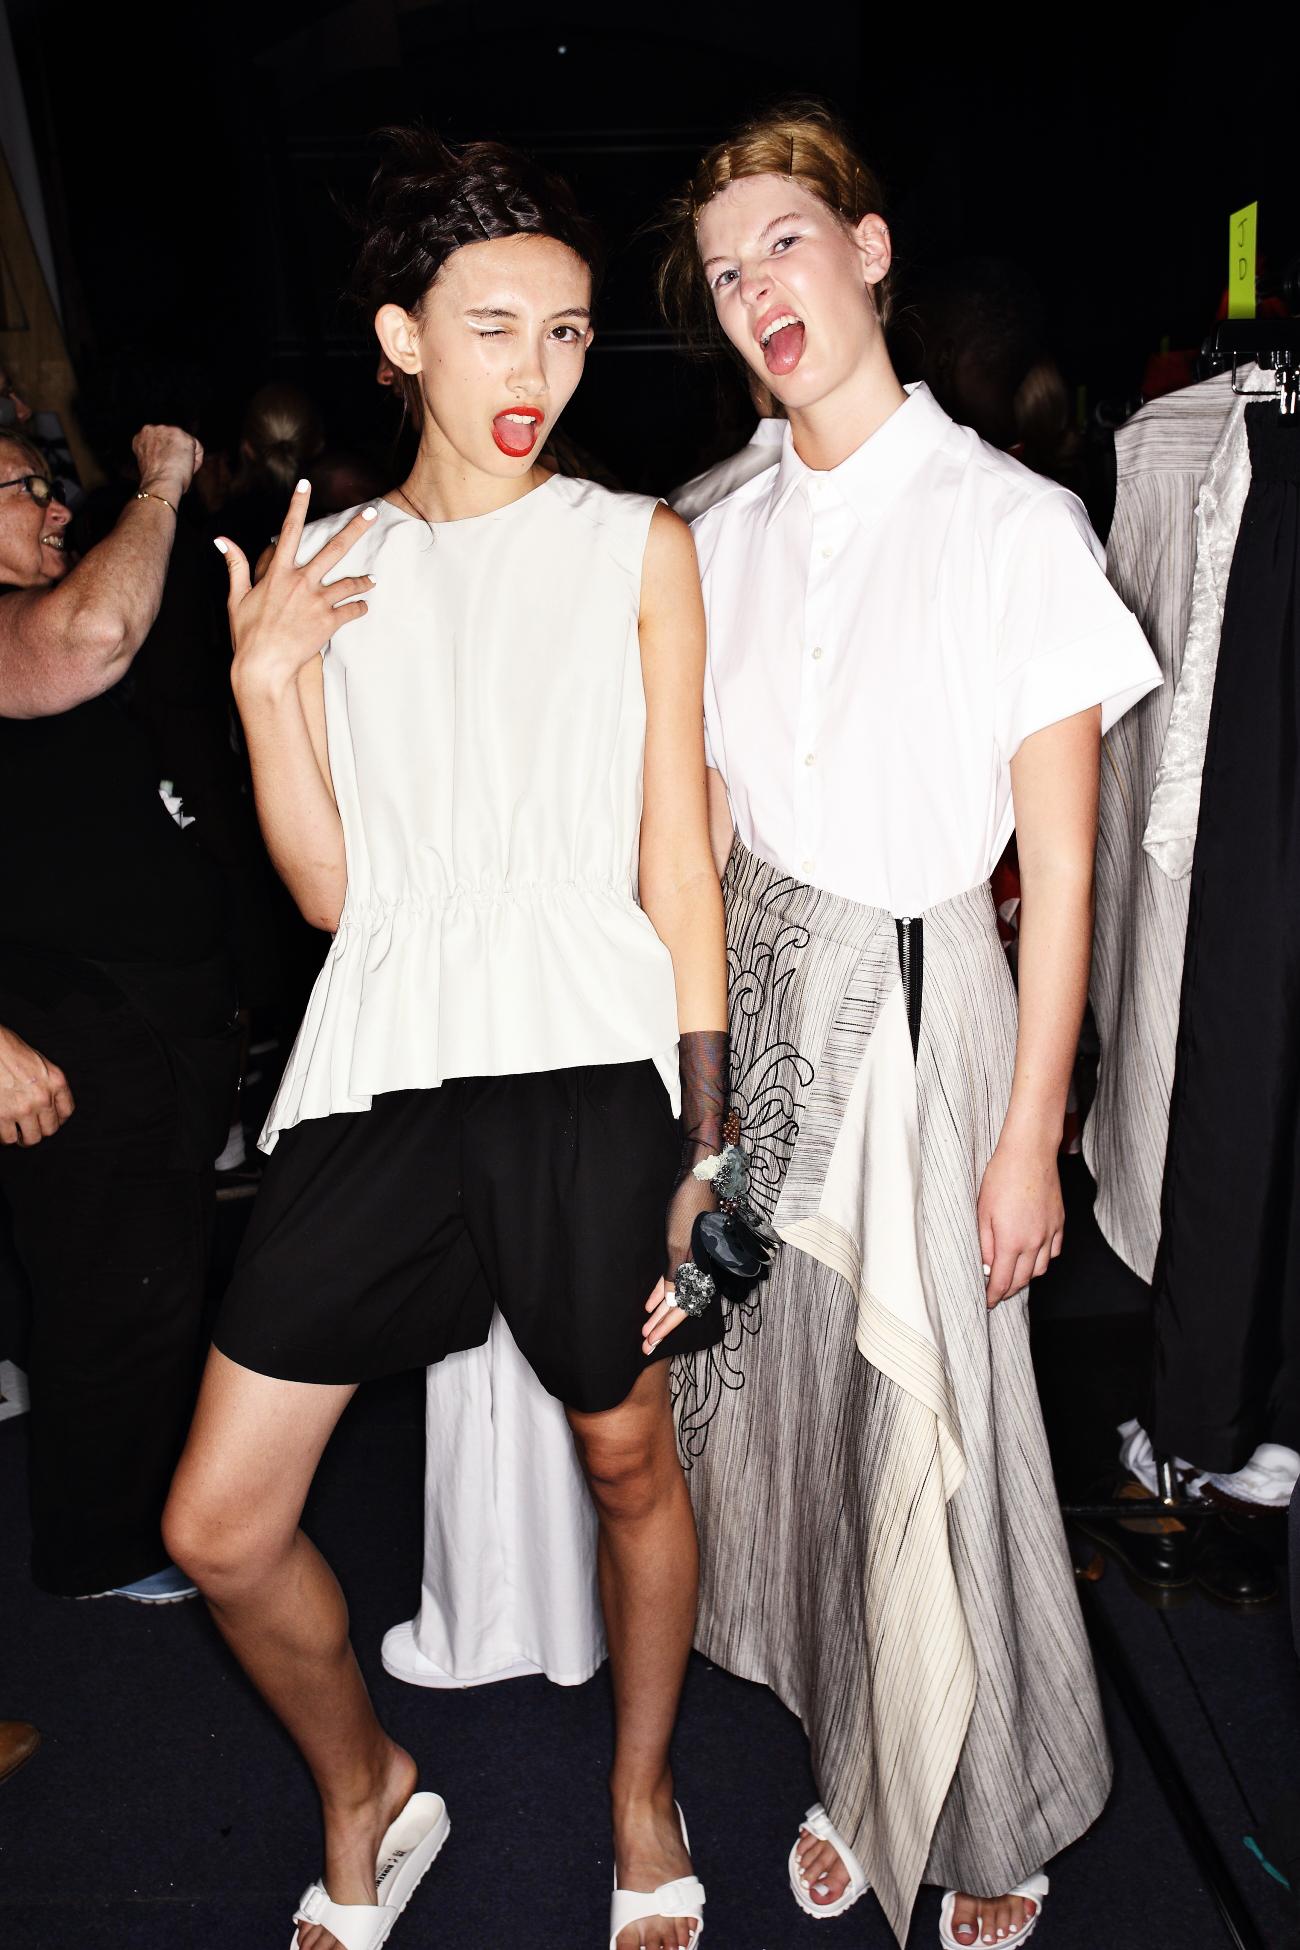 Akira SS1617 Fashion Show Sydney Backstage